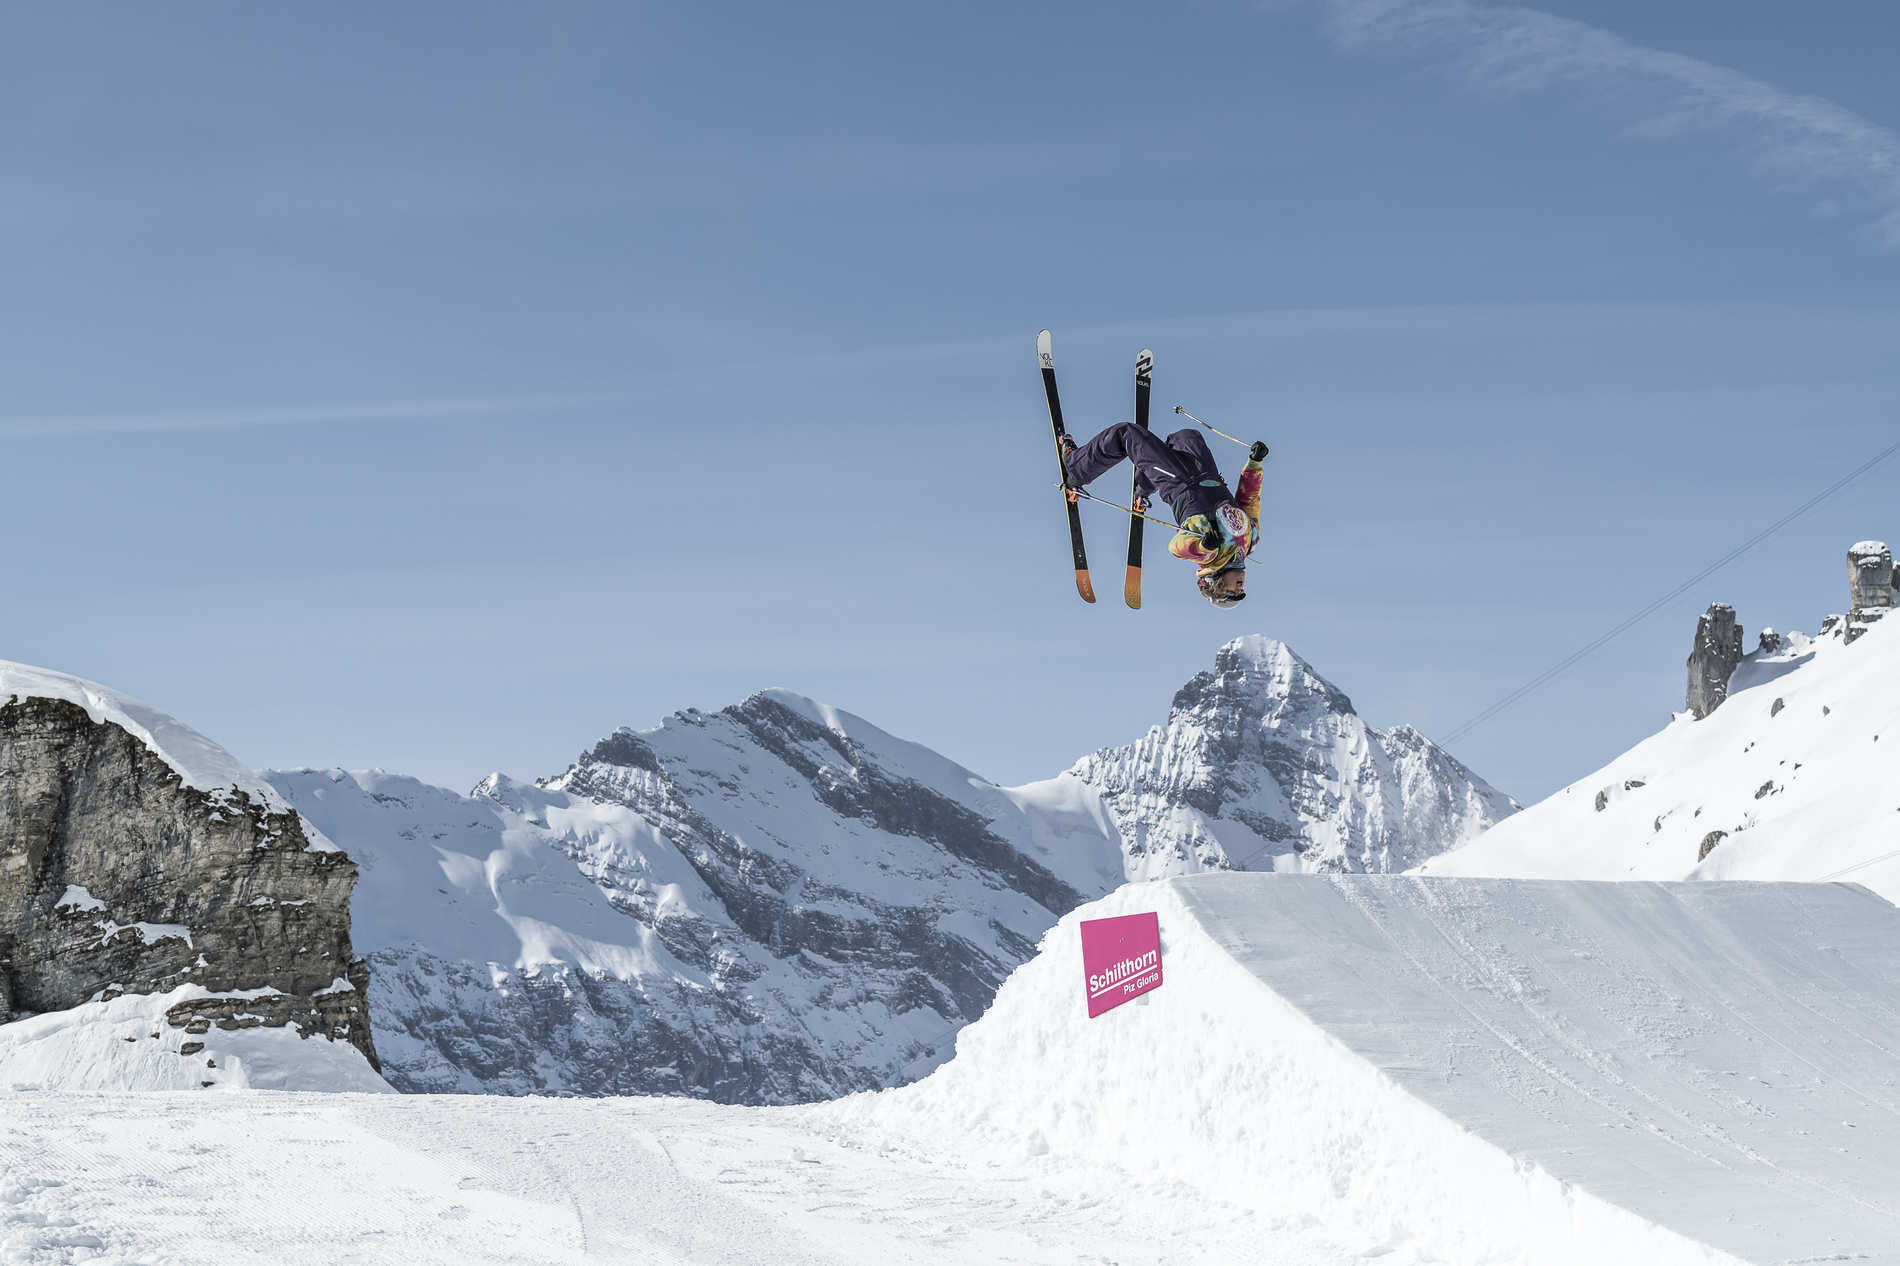 web schilthorn 29 03 2021 action fs sb unknown michael donadel snowpark 006